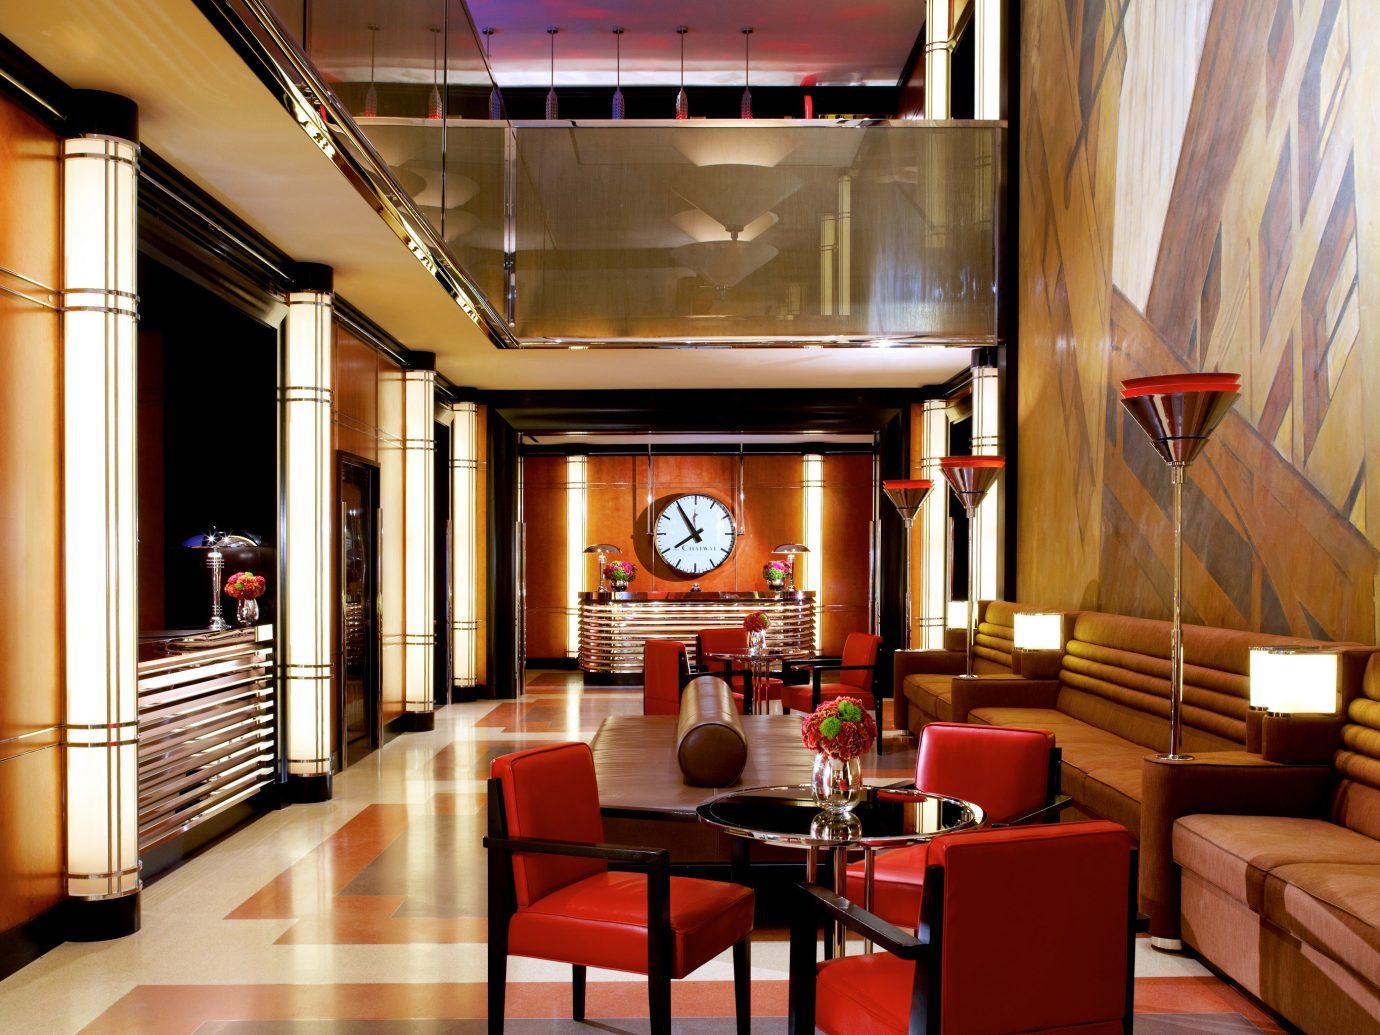 Bar Dining Drink Eat Hotels Luxury Modern indoor table floor room Lobby interior design living room restaurant estate home recreation room Design dining room Resort furniture area